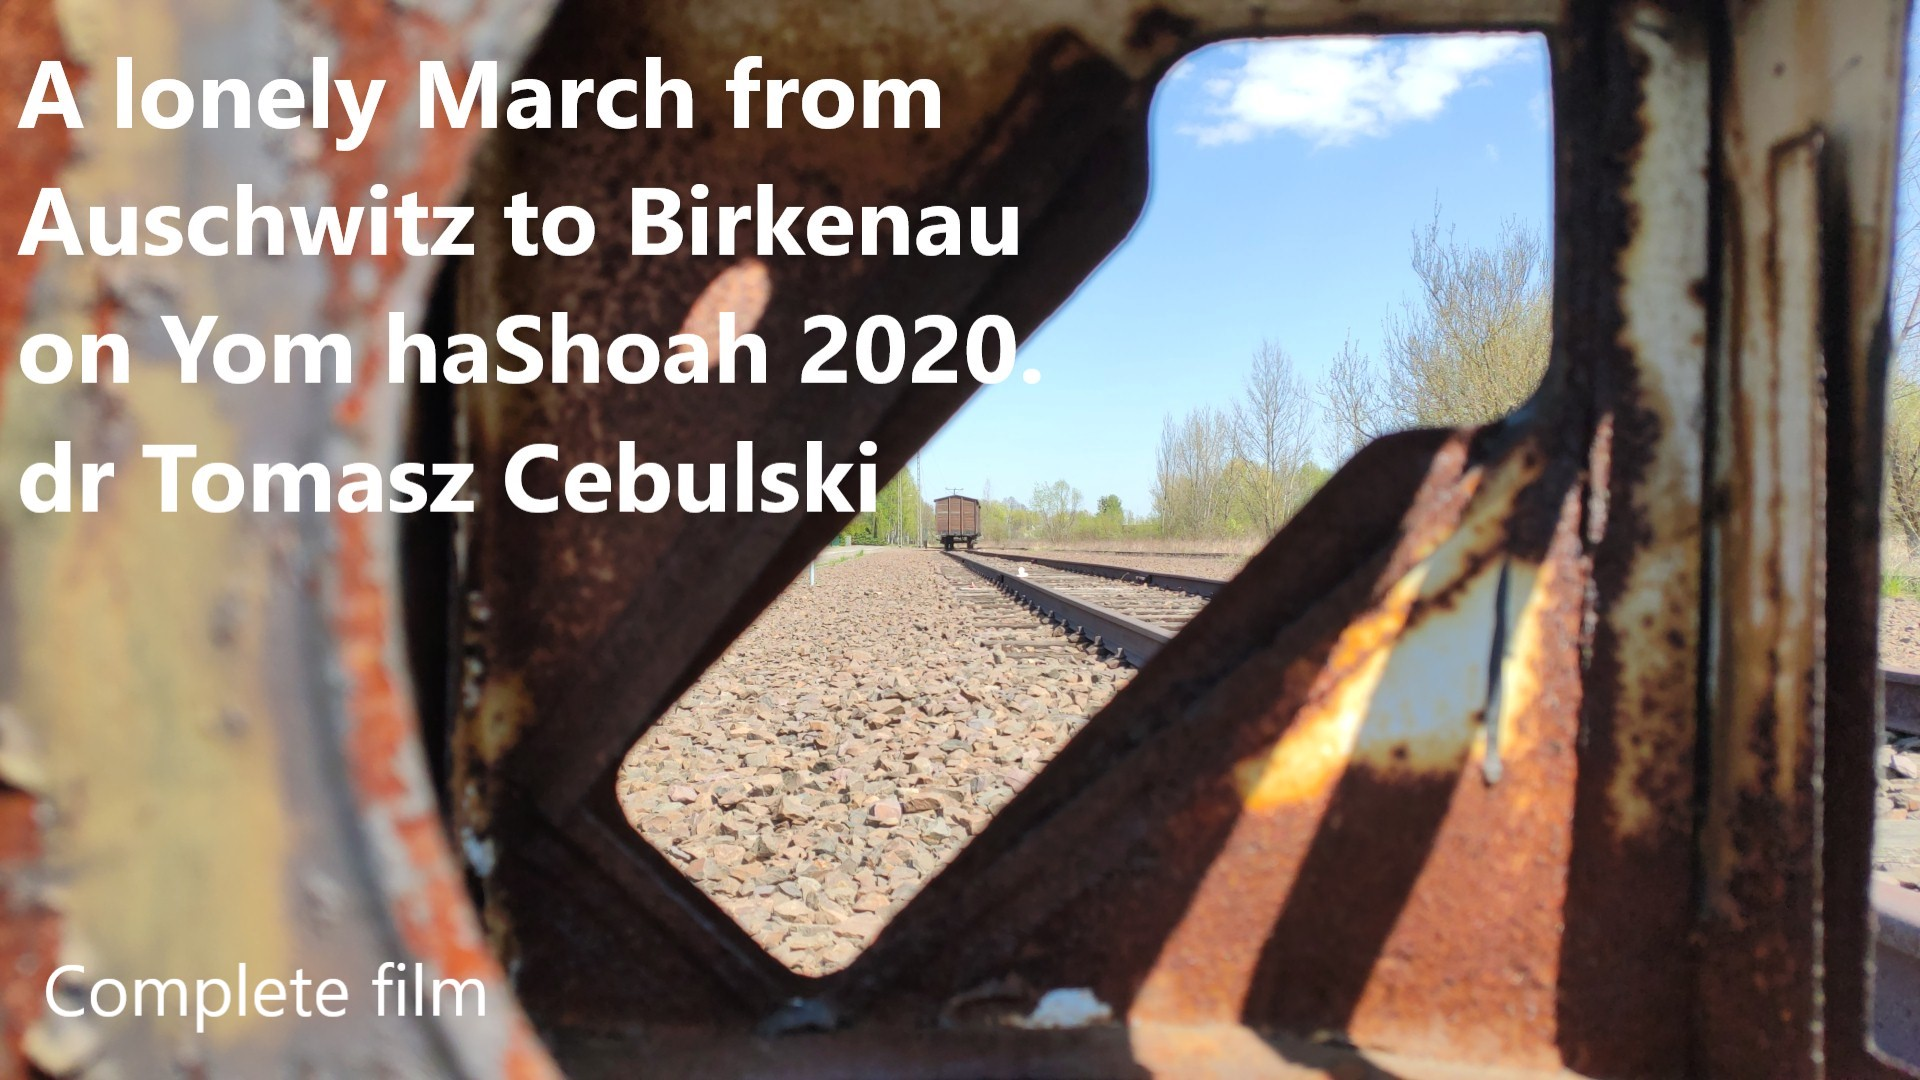 A lonely March from Auschwitz to Birkenau on Yom haShoah April 21st, 2020 by dr Tomasz Cebulski.